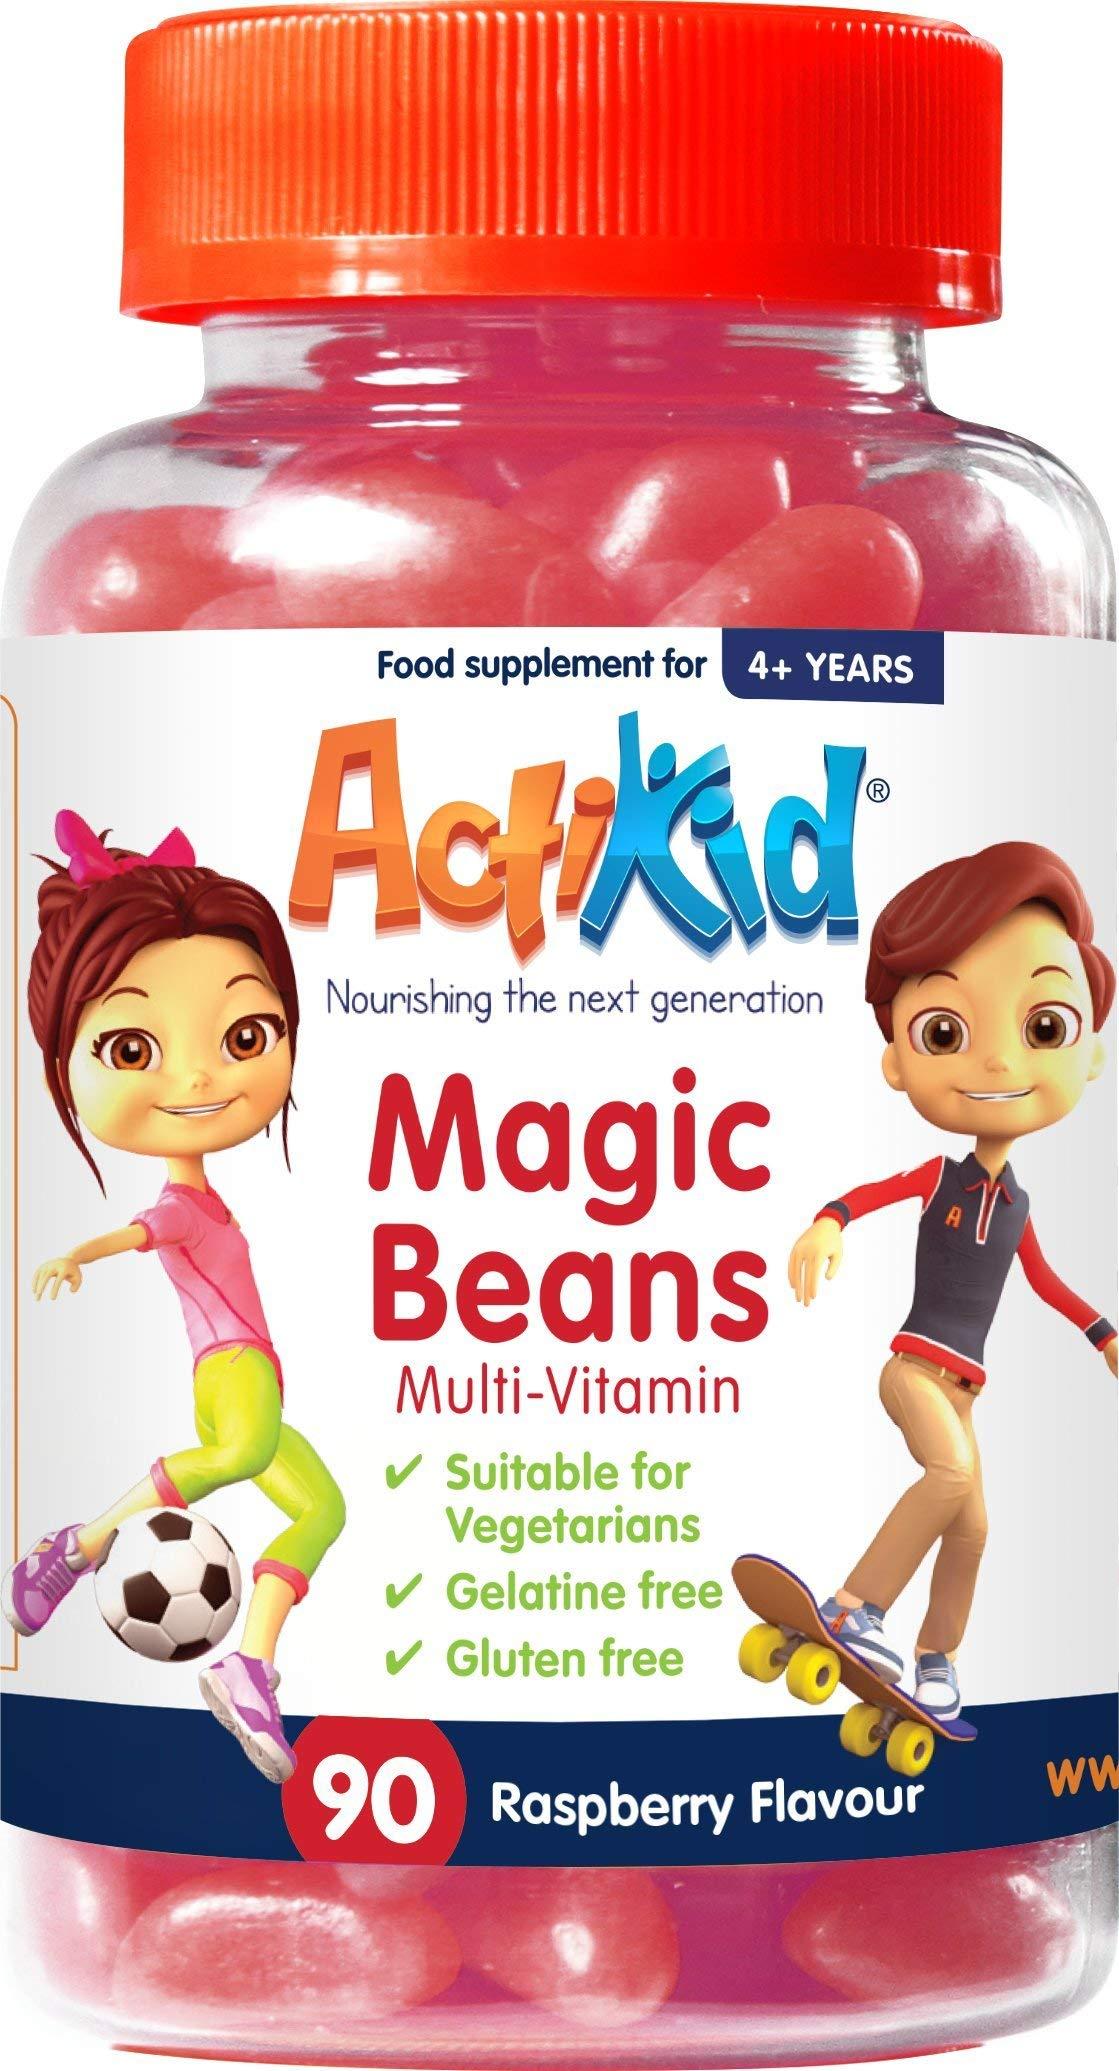 ActiKid Magic Beans Multi-Vitamin 90x Raspberry Flavour, Gelatin Free, Children's Vitamin, Immune System Booster